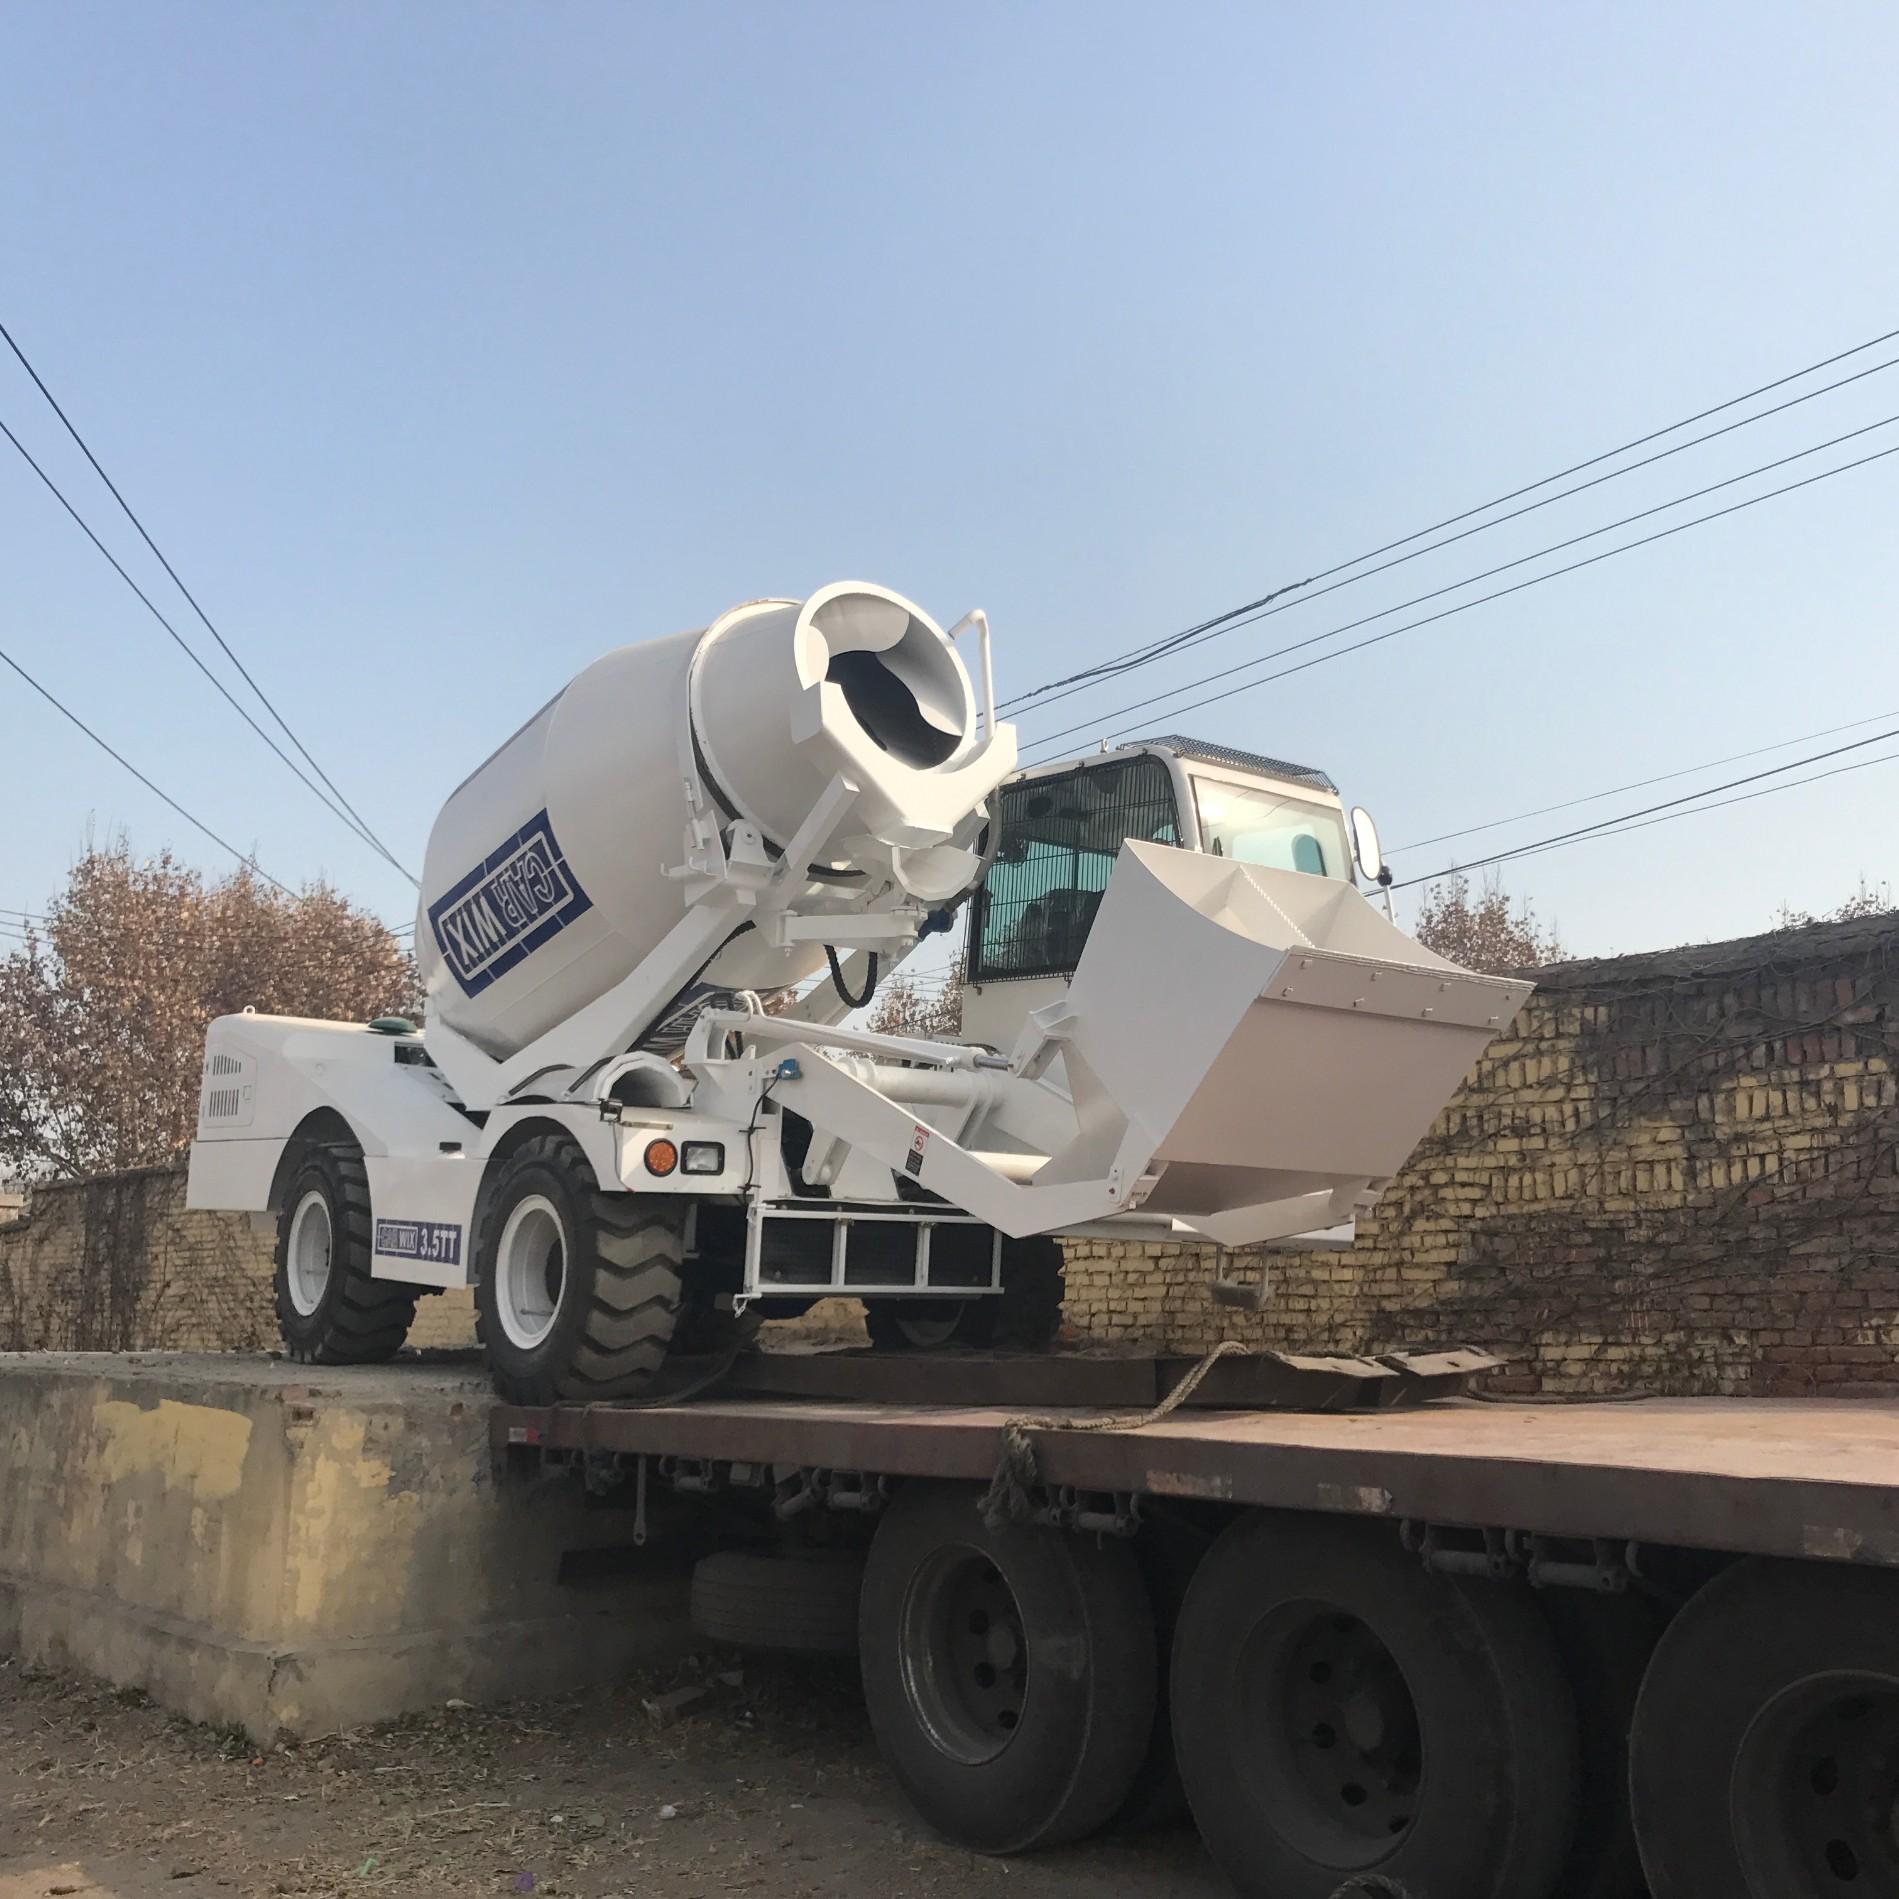 Sales Self Loading Cement Mixer, Buy Self Loading Cement Mixer, Self Loading Cement Mixer Factory, Self Loading Cement Mixer Brands